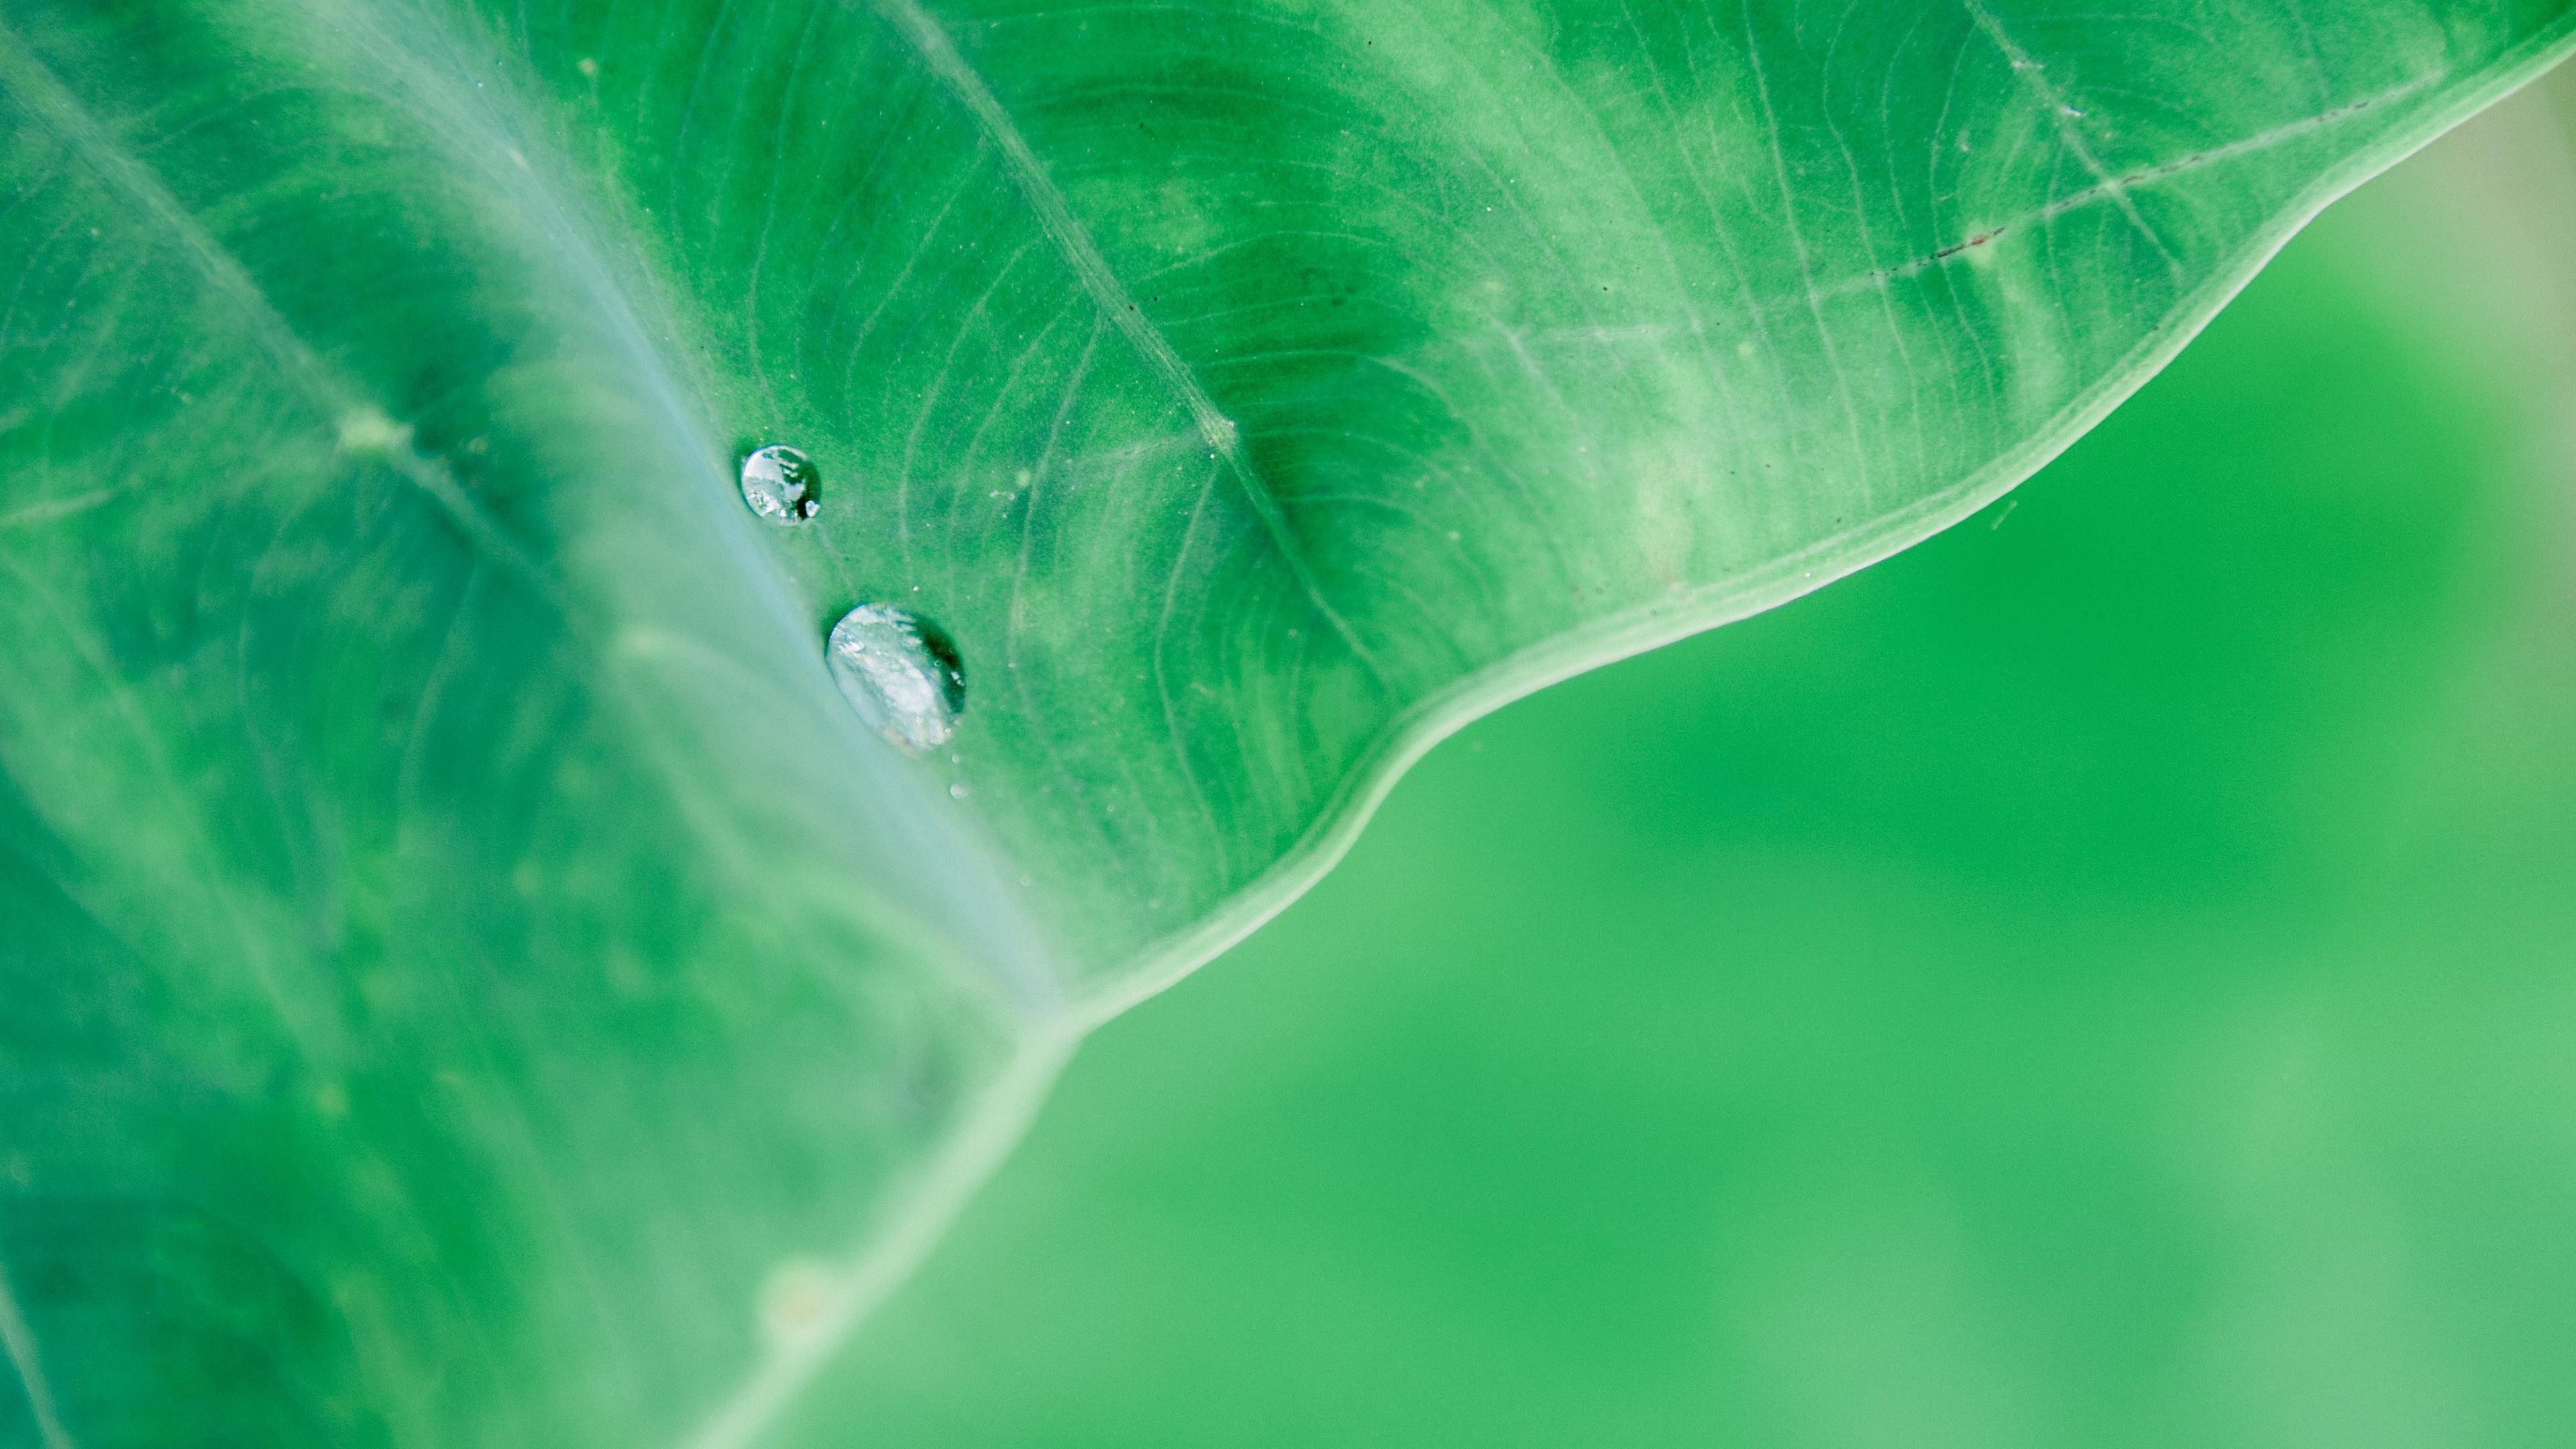 Water Drop On Leaf Macro 4k Wallpaper Https Hdwallpapersmafia Com Water Drop On Leaf Macro 4 Macro Photography Water Drop On Leaf Photography Backdrop Stand